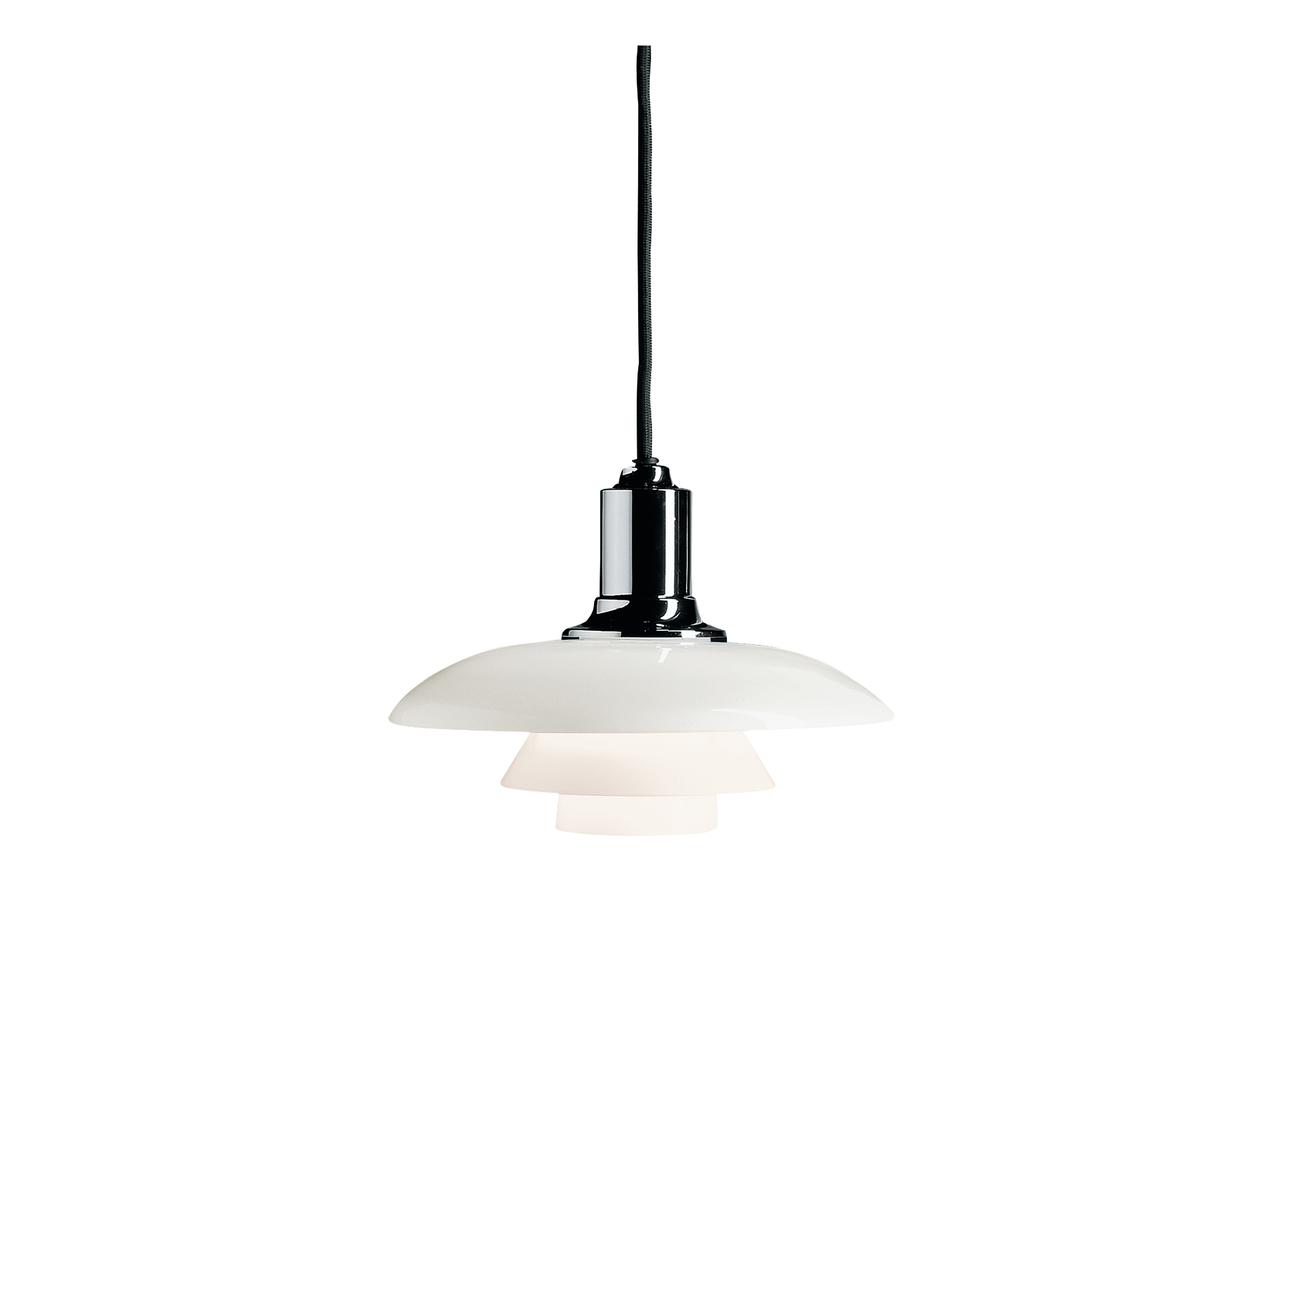 Louis Poulsen PH 2/1 Hanglamp-Chroom